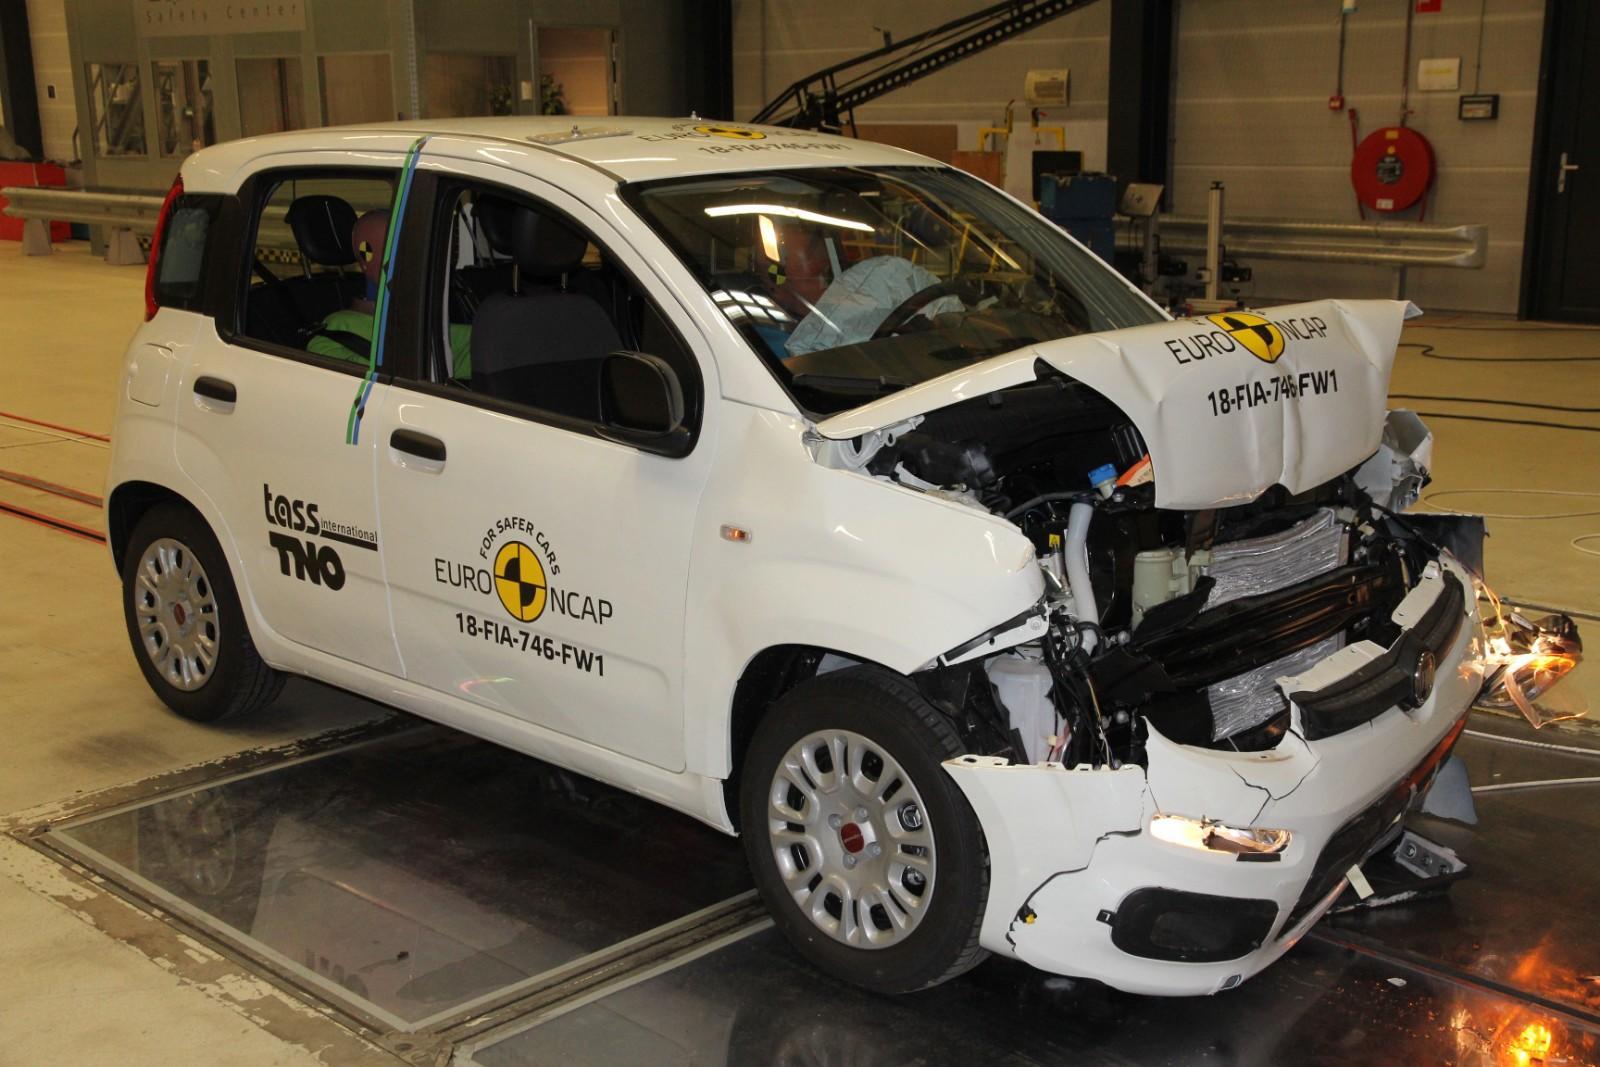 Fiat Panda Euro NCAP - Fiat Panda Euro NCAP